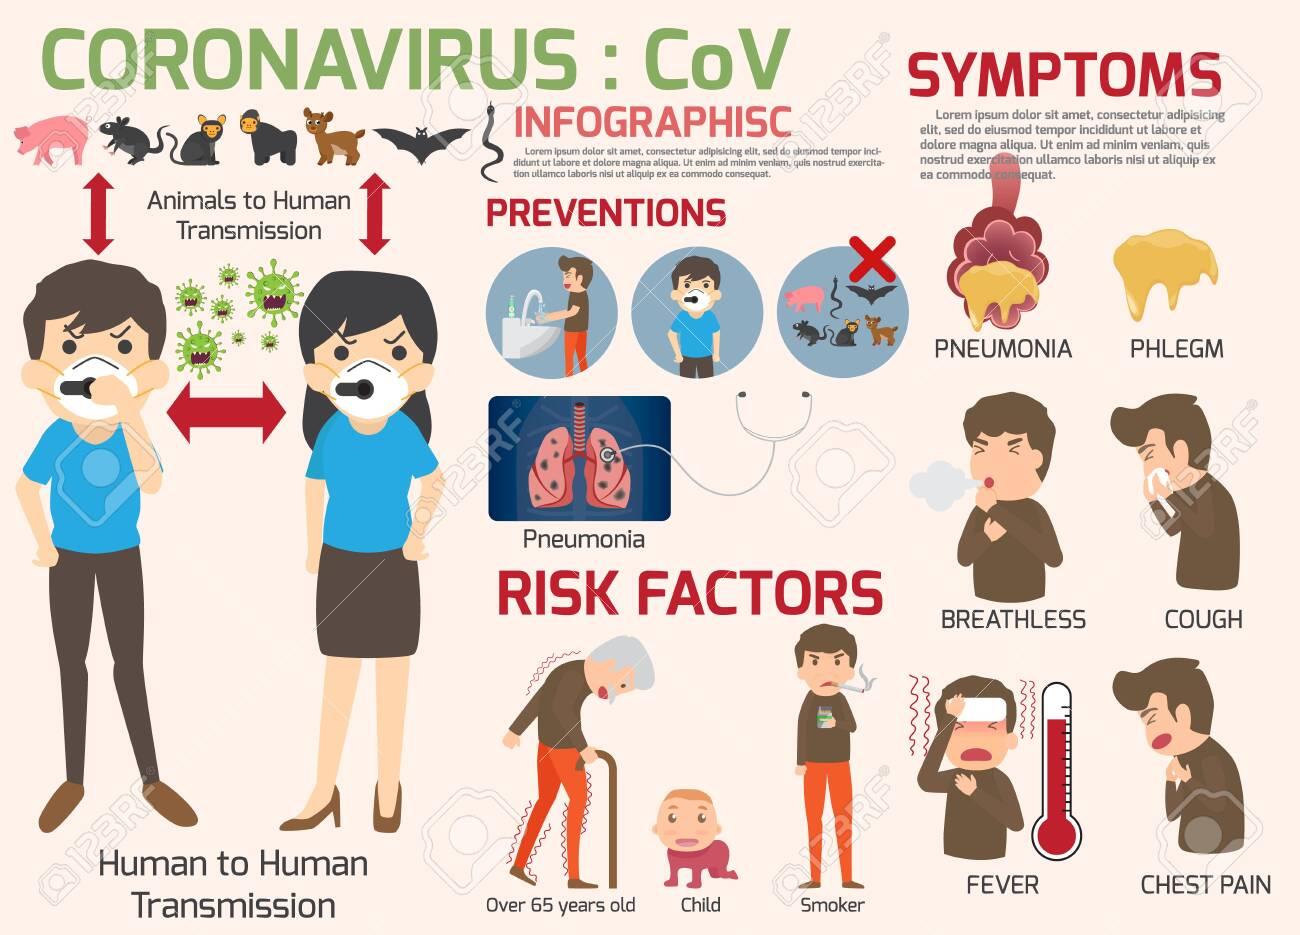 Coronavirus : CoV infographics elements, human are showing coronavirus symptoms and risk factors. health and medical. Novel Coronavirus 2019. Pneumonia disease. vector illustration. - 139364690